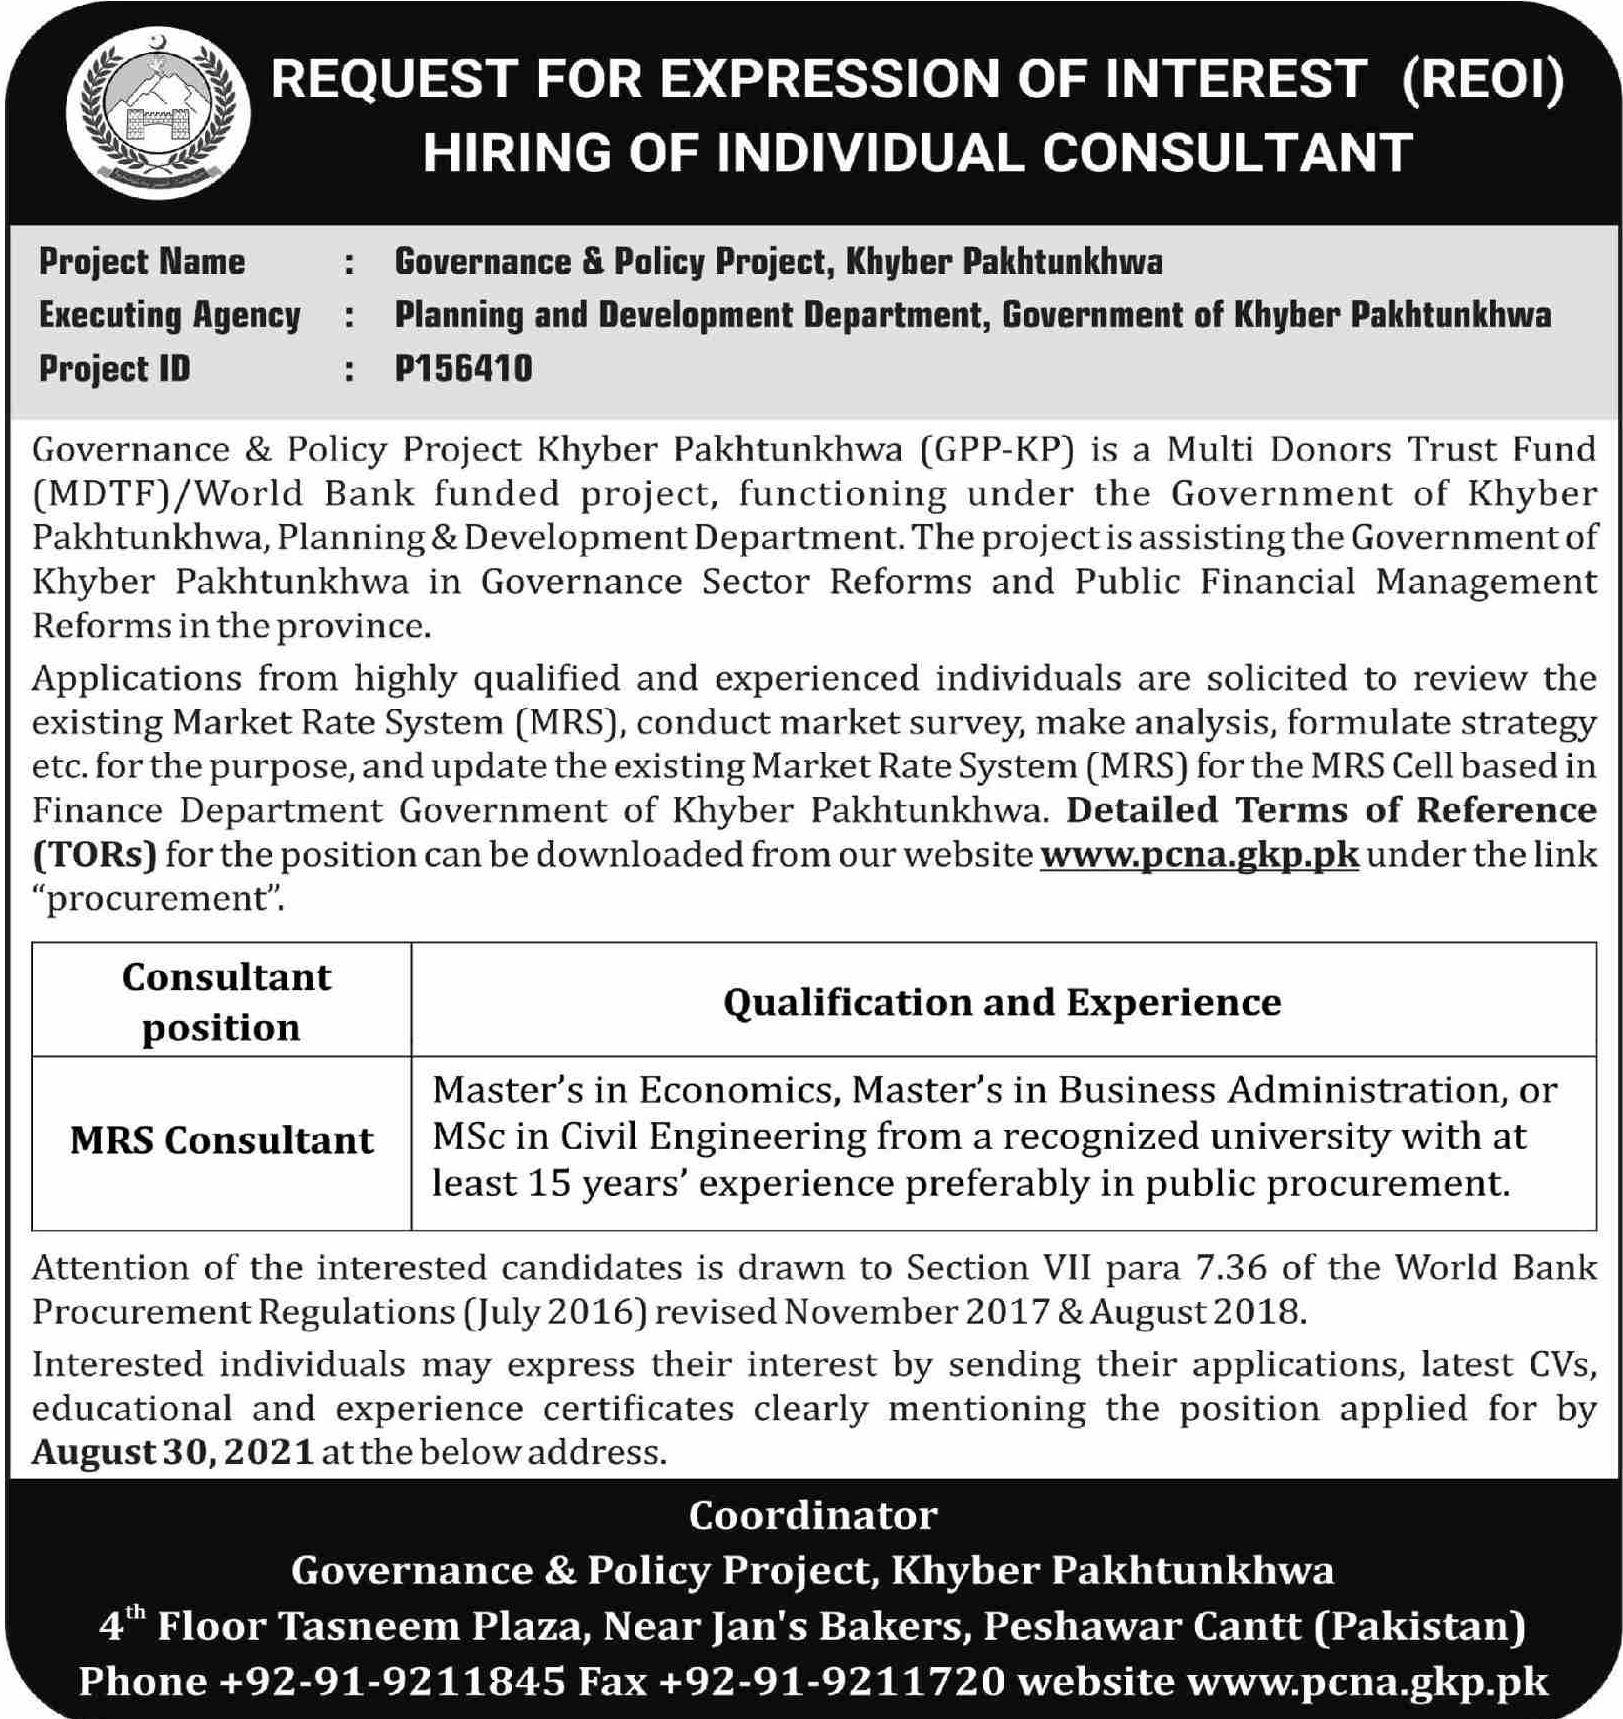 Governance & Policy Project Khyber Pakhtunkhwa Vacancies 2021 1